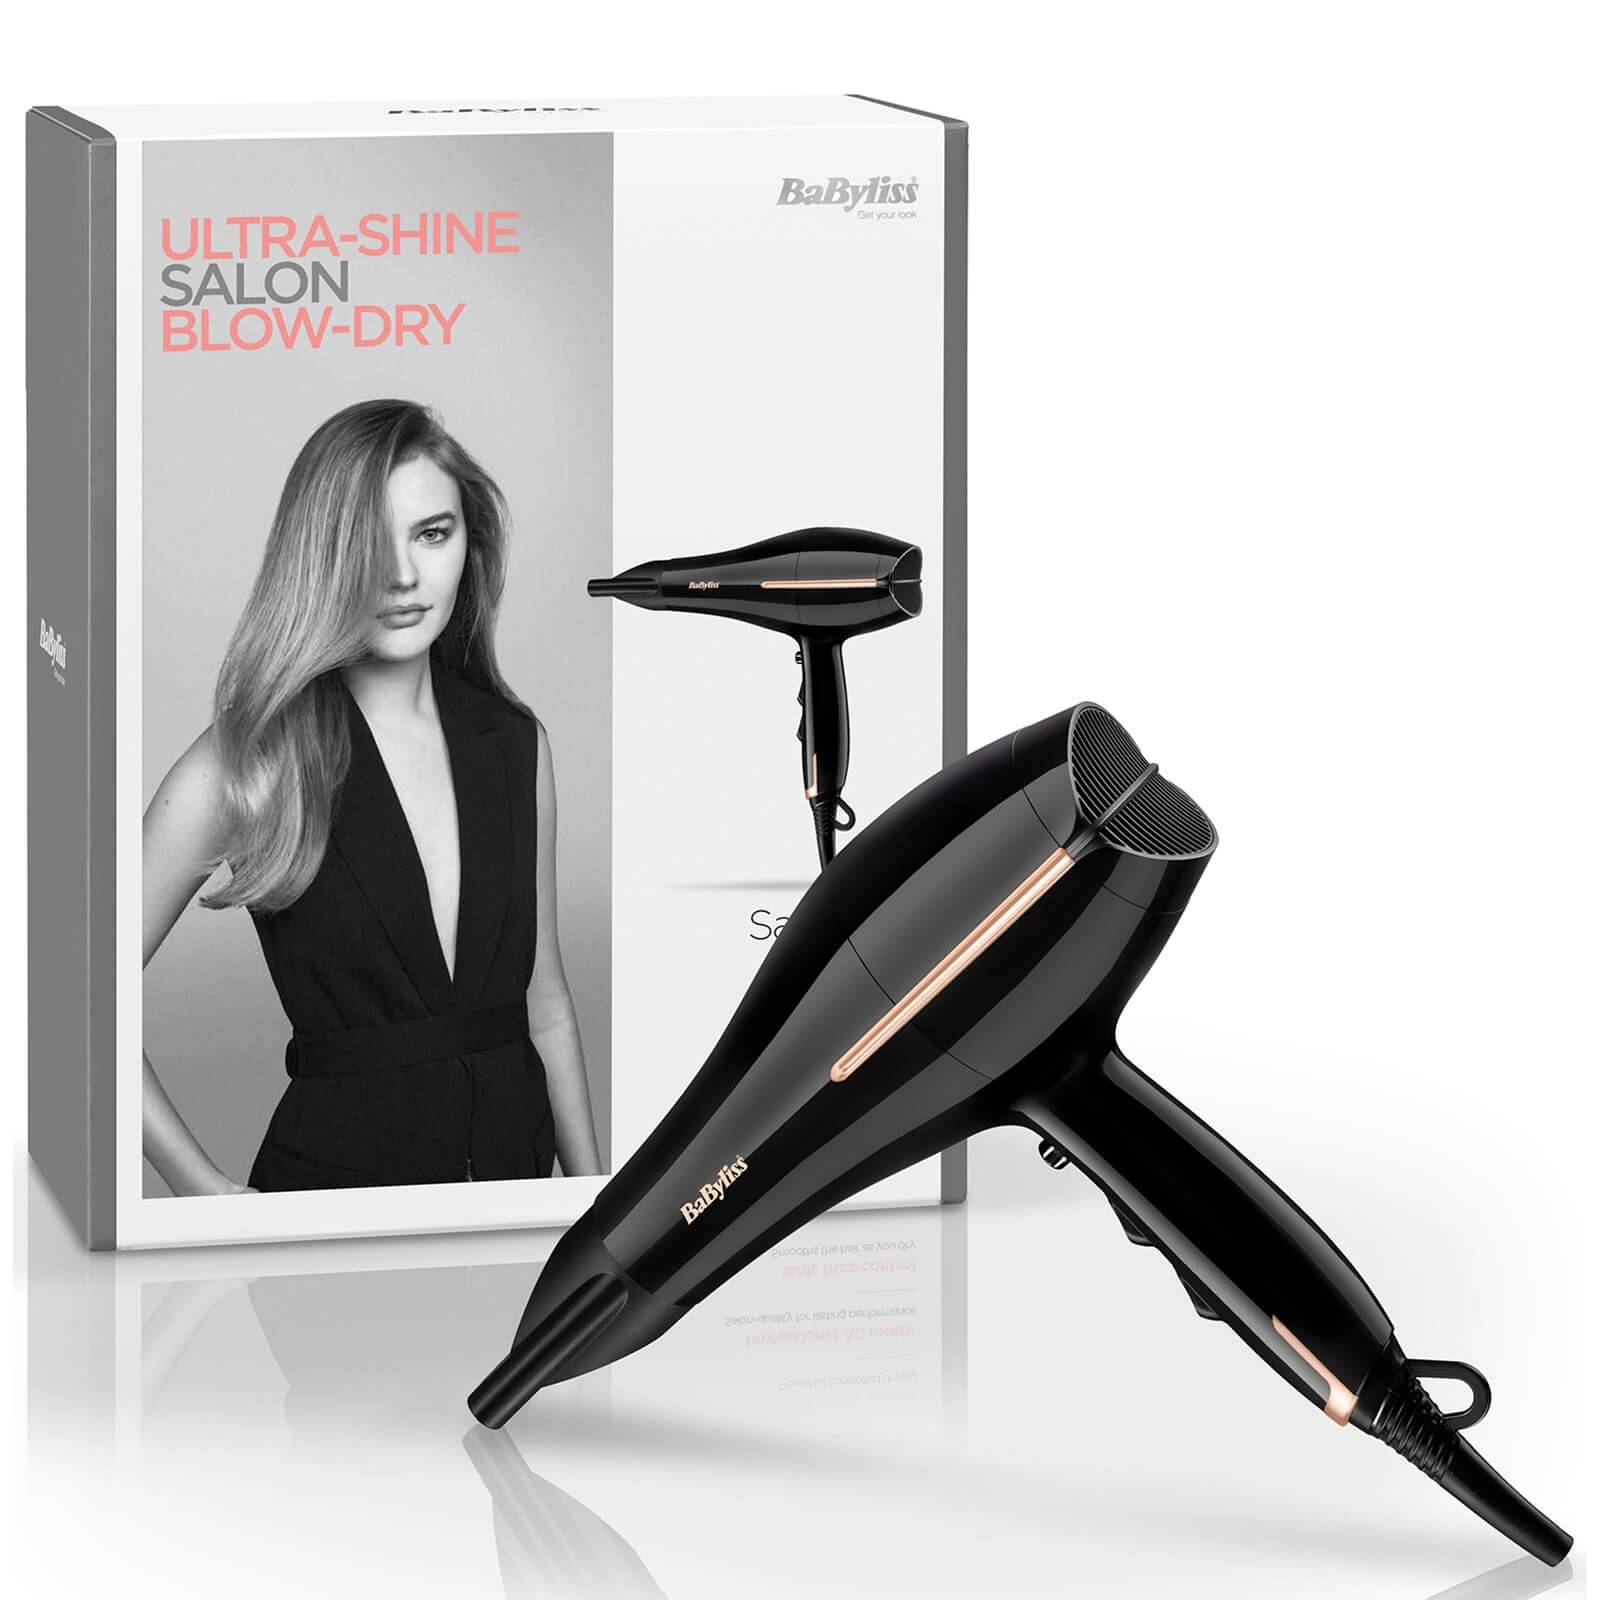 BaByliss Salon Pro 2200 Hair Dryer